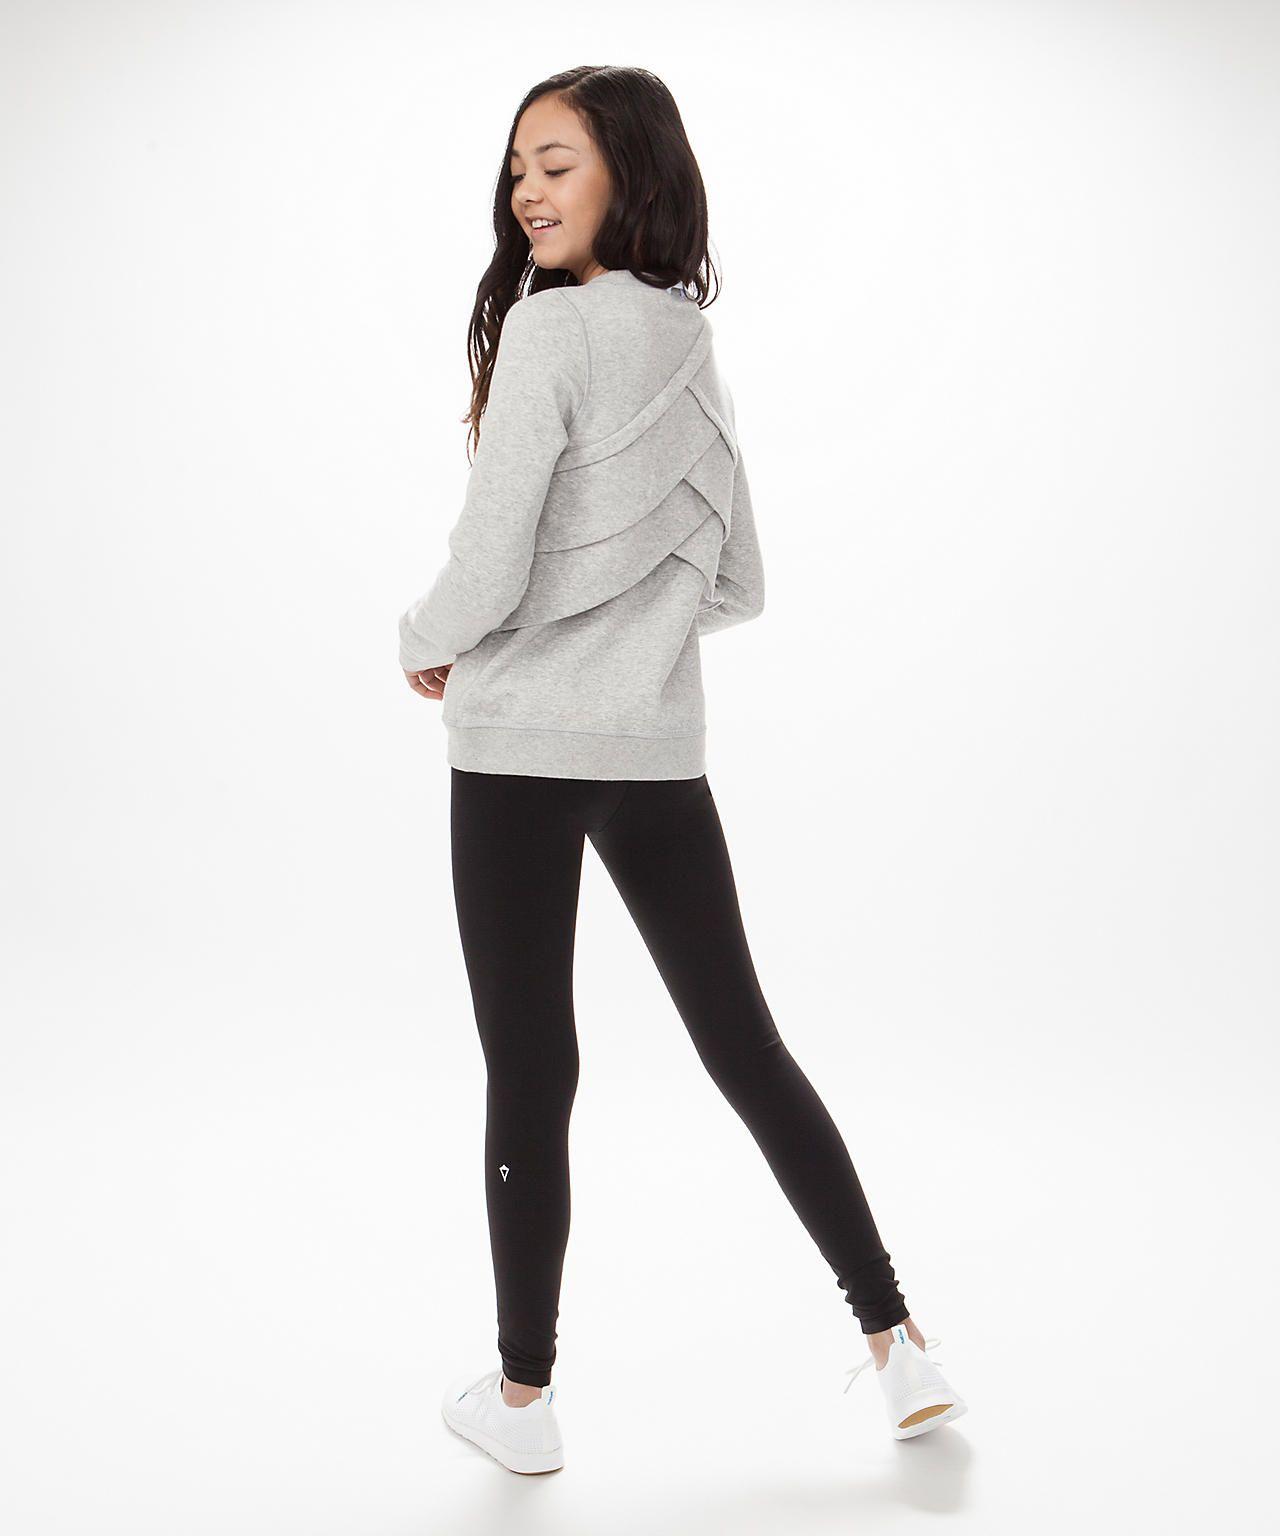 heathered light grey | Activewear/Athleisure_Design